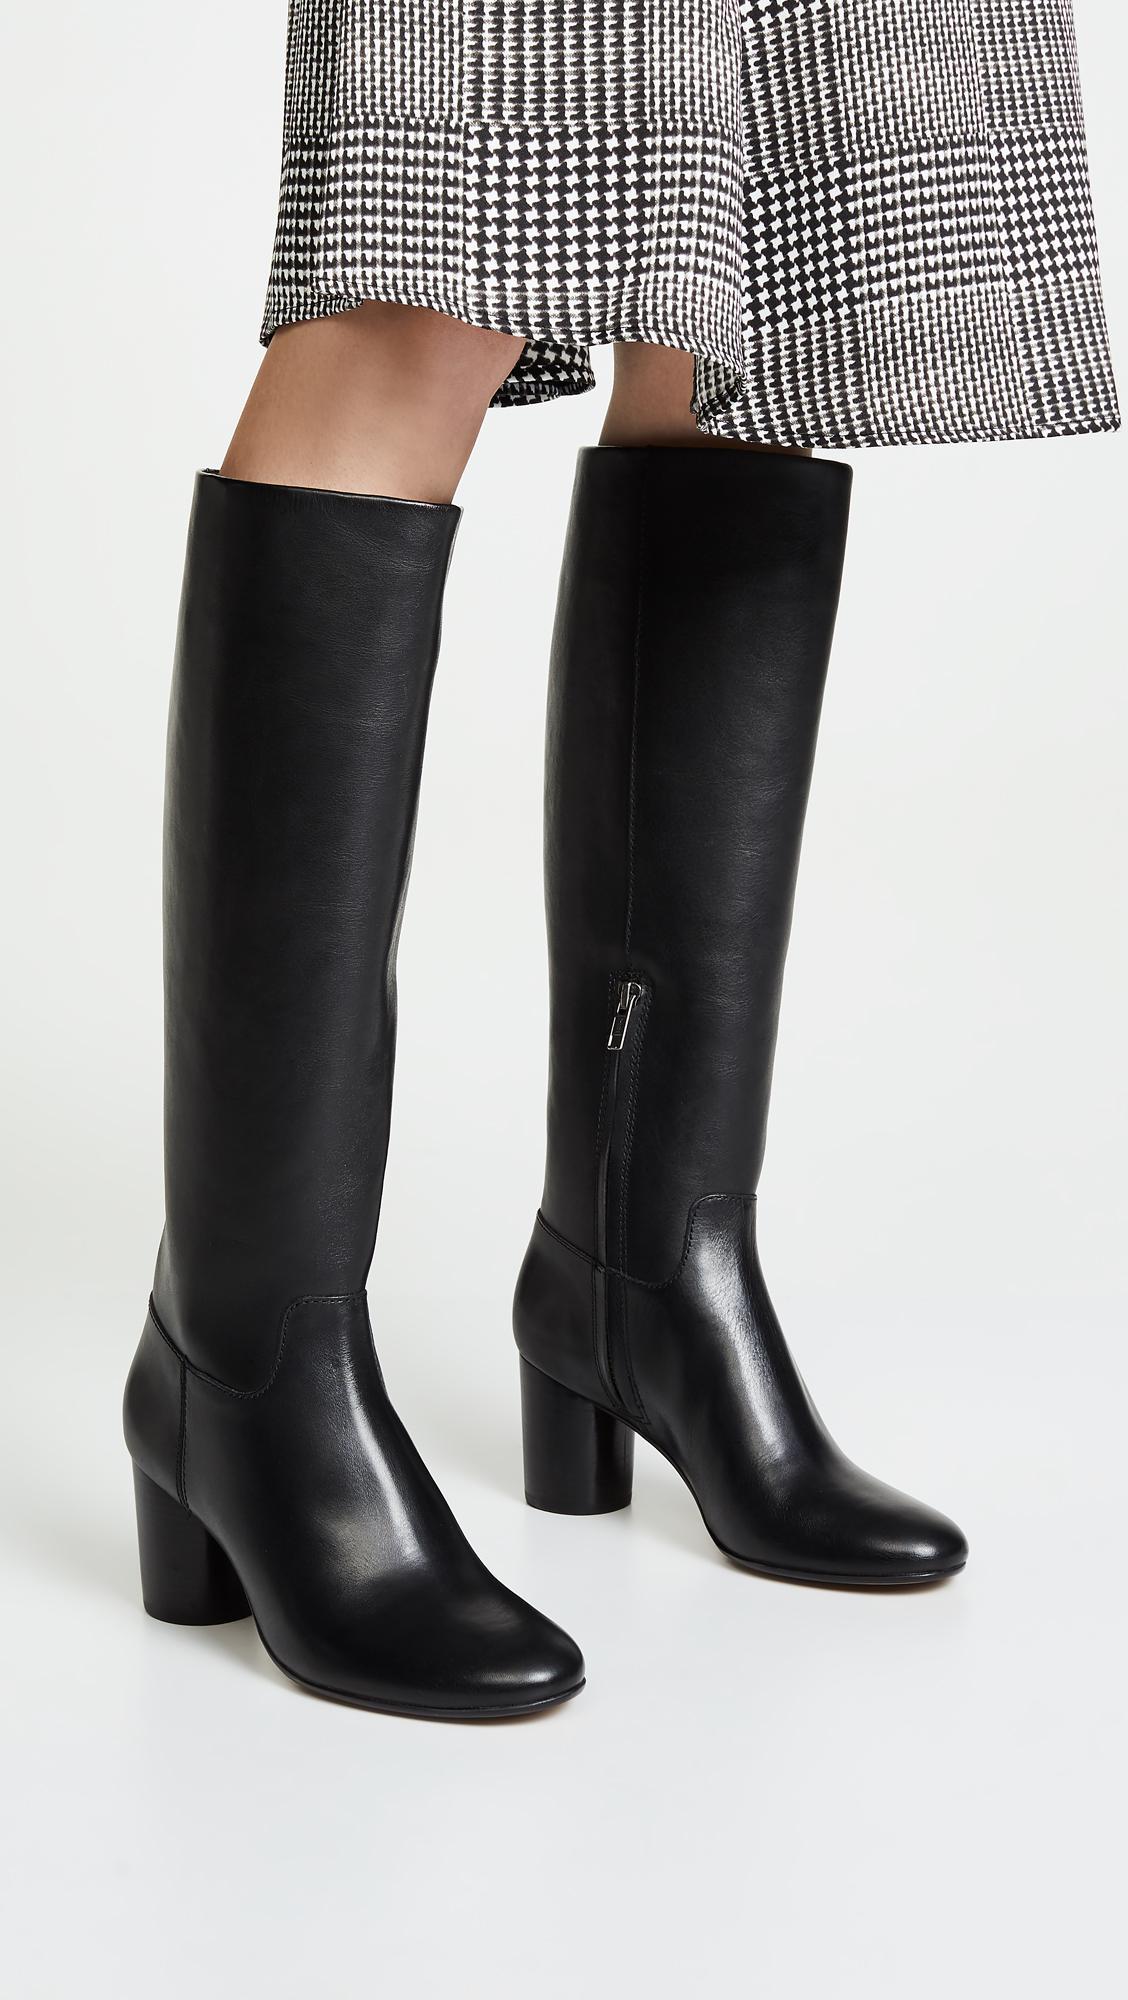 9c8e01a5ff2 Madewell - Black The Scarlett Tall Boots - Lyst. View fullscreen